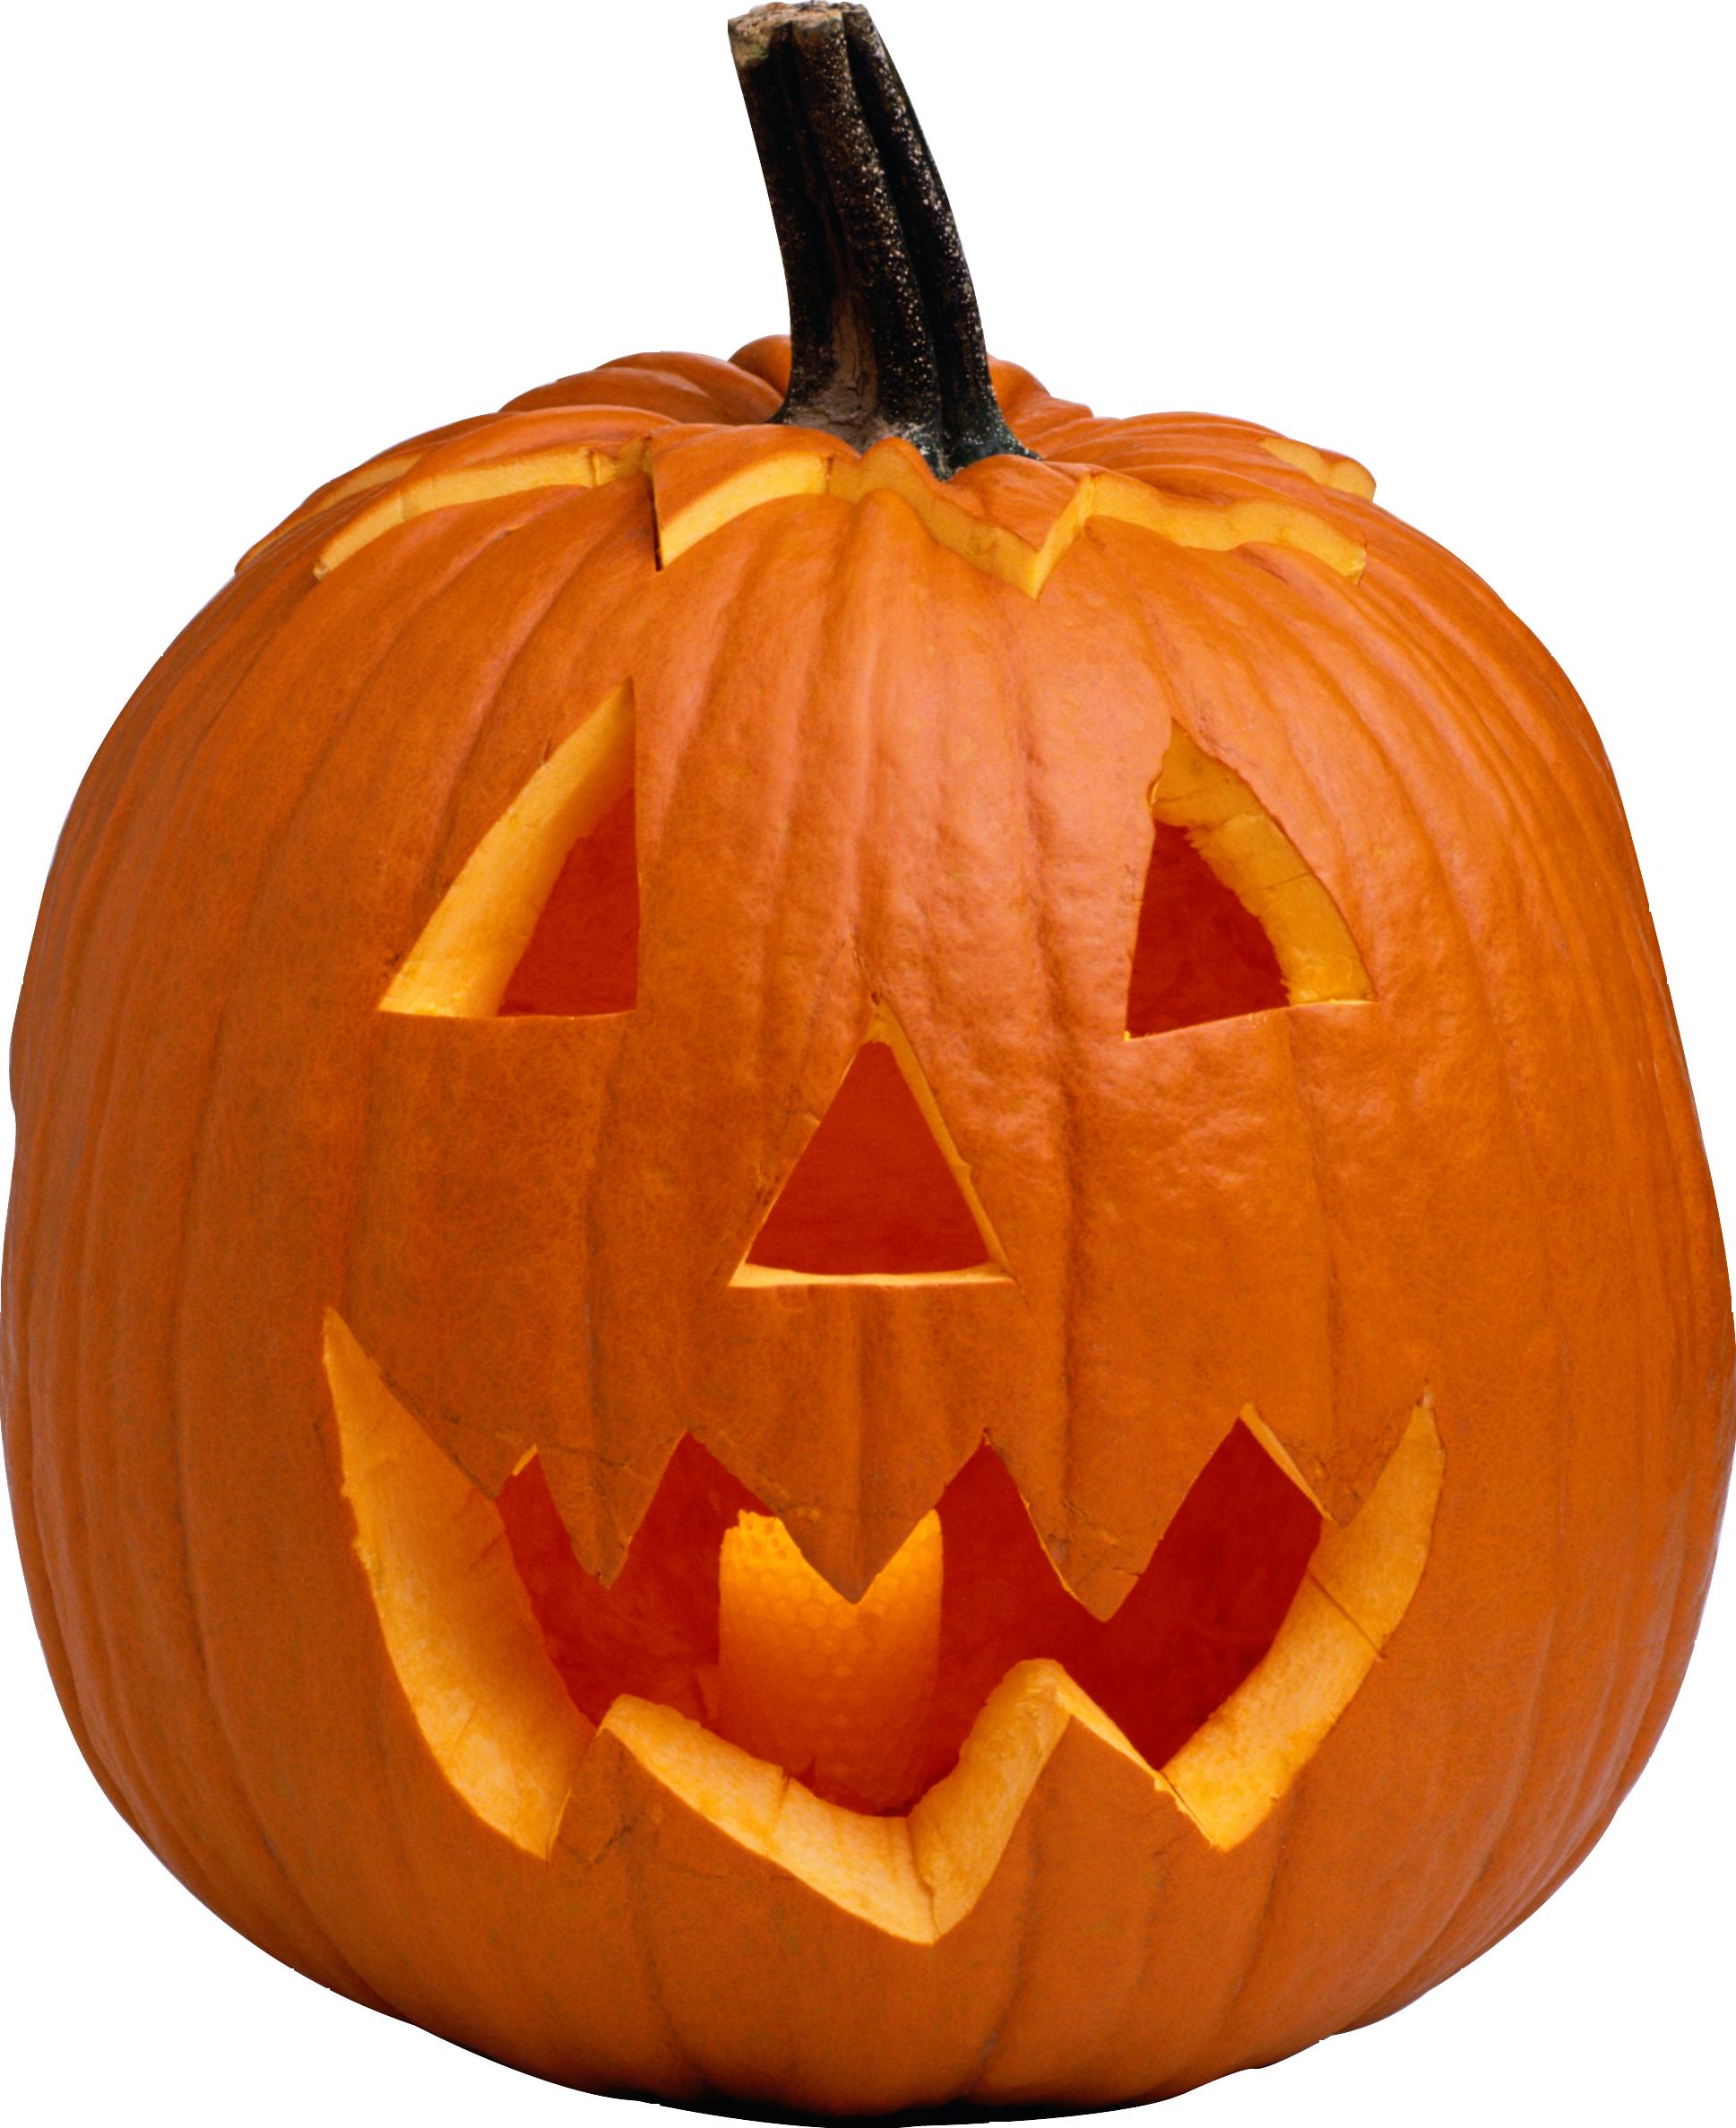 Halloween Pumpkin PNG Image - PurePNG | Free transparent CC0 PNG ... image royalty free